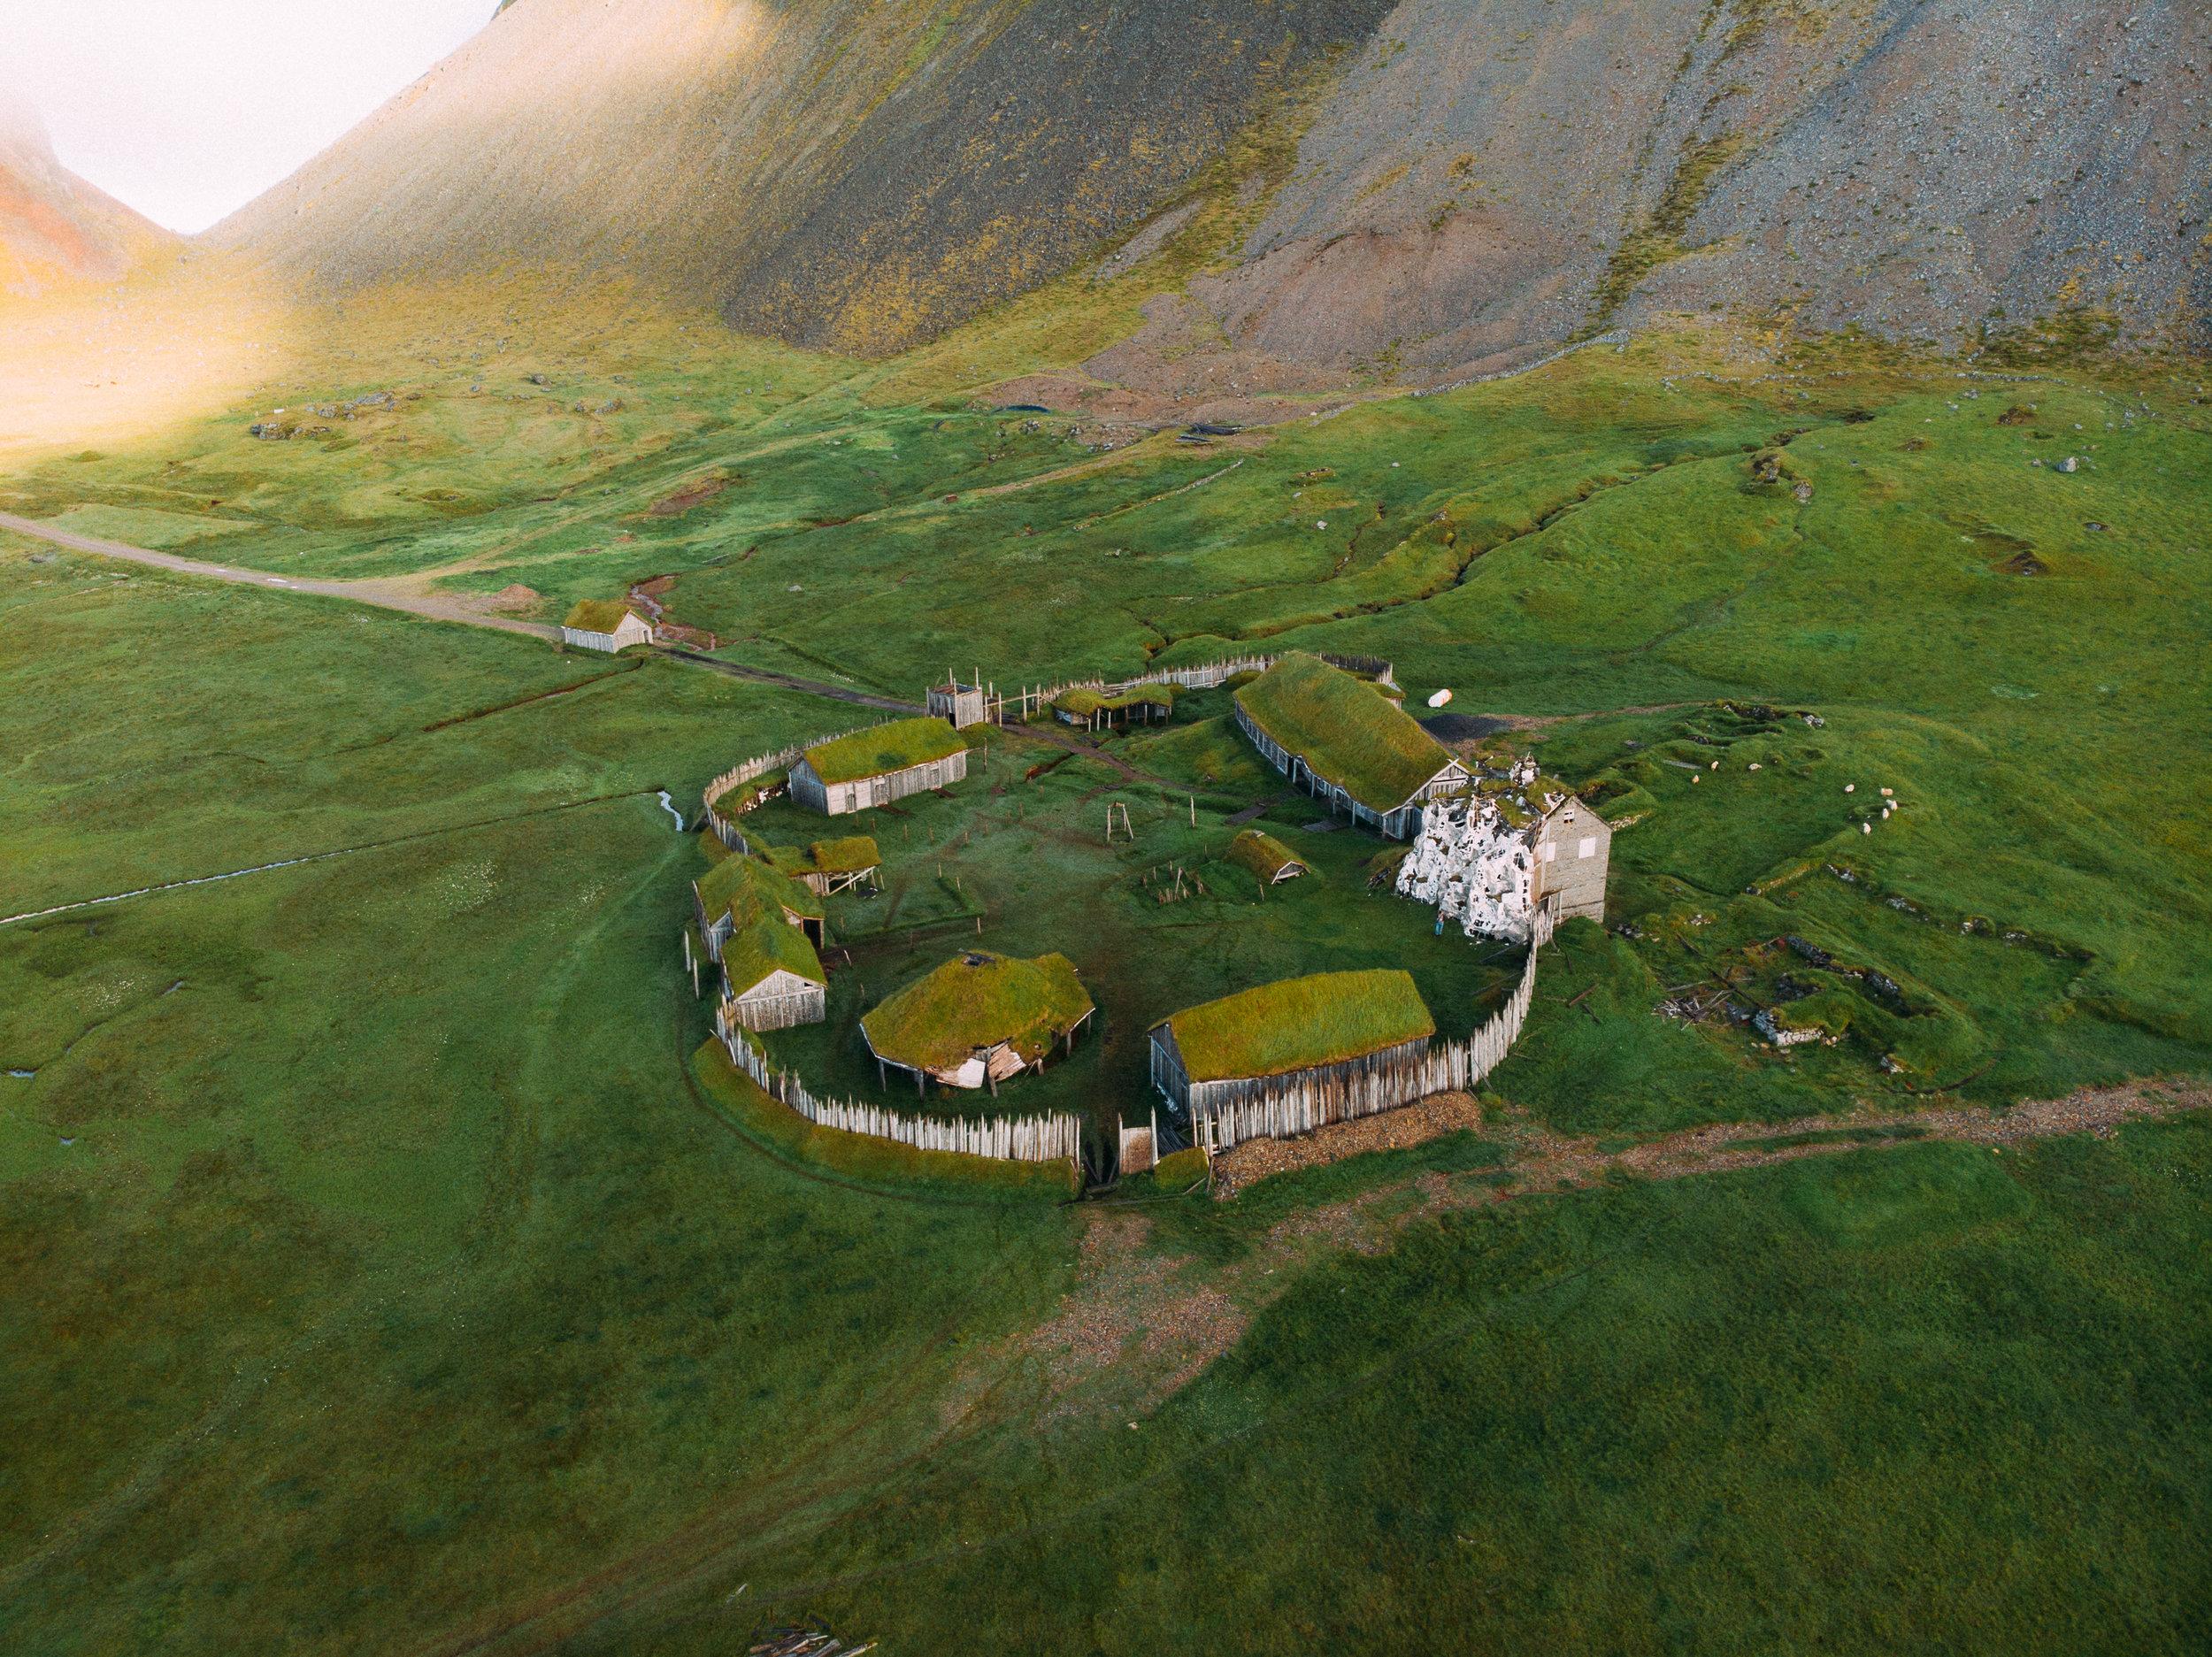 Viking Village -  [64.2586105,-15.0942715] -  DJI Mavic Air Drone